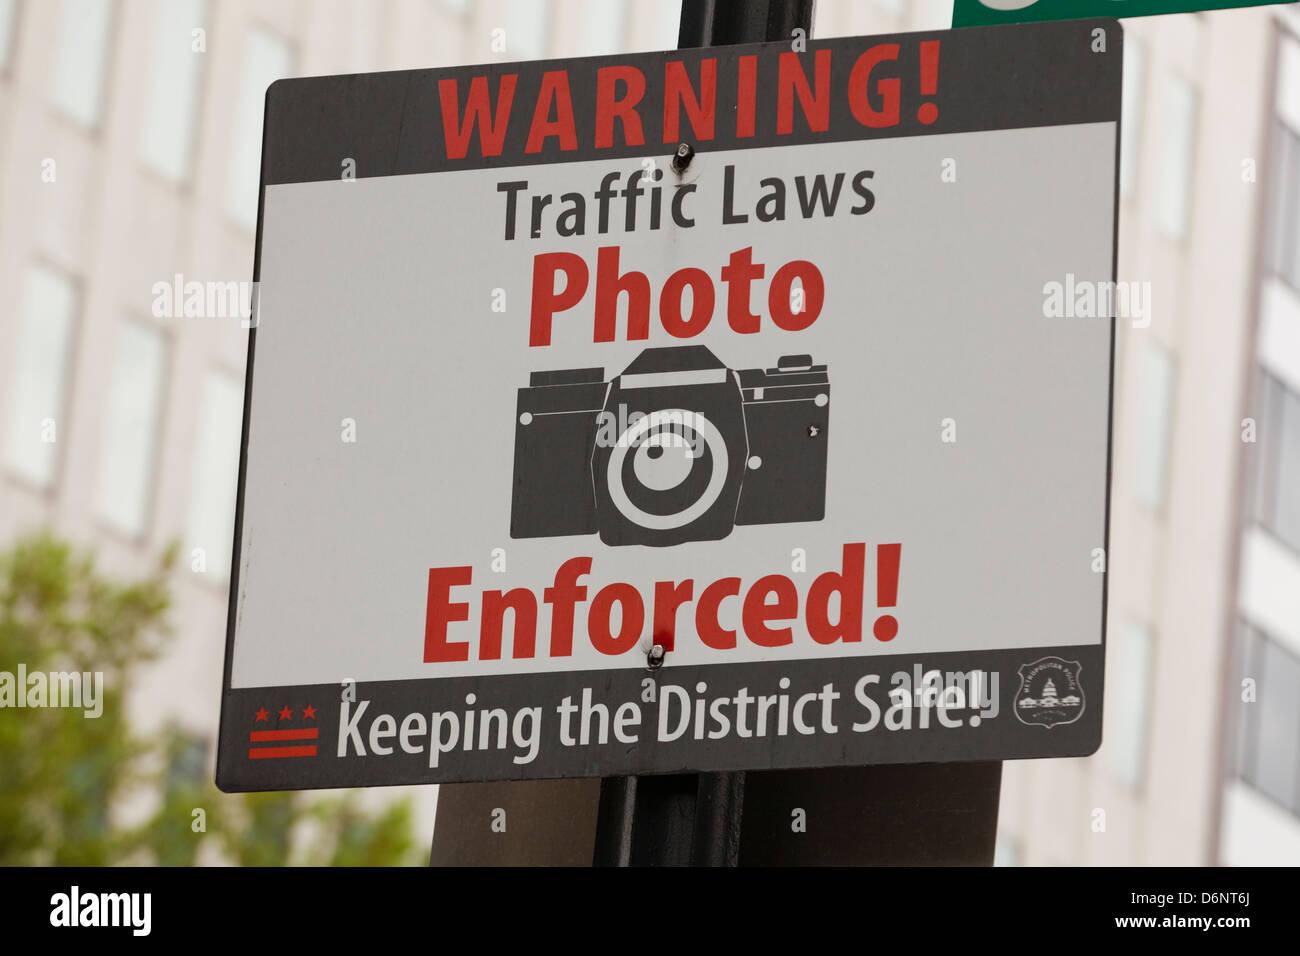 Traffic photo enforcement warning sign - Stock Image